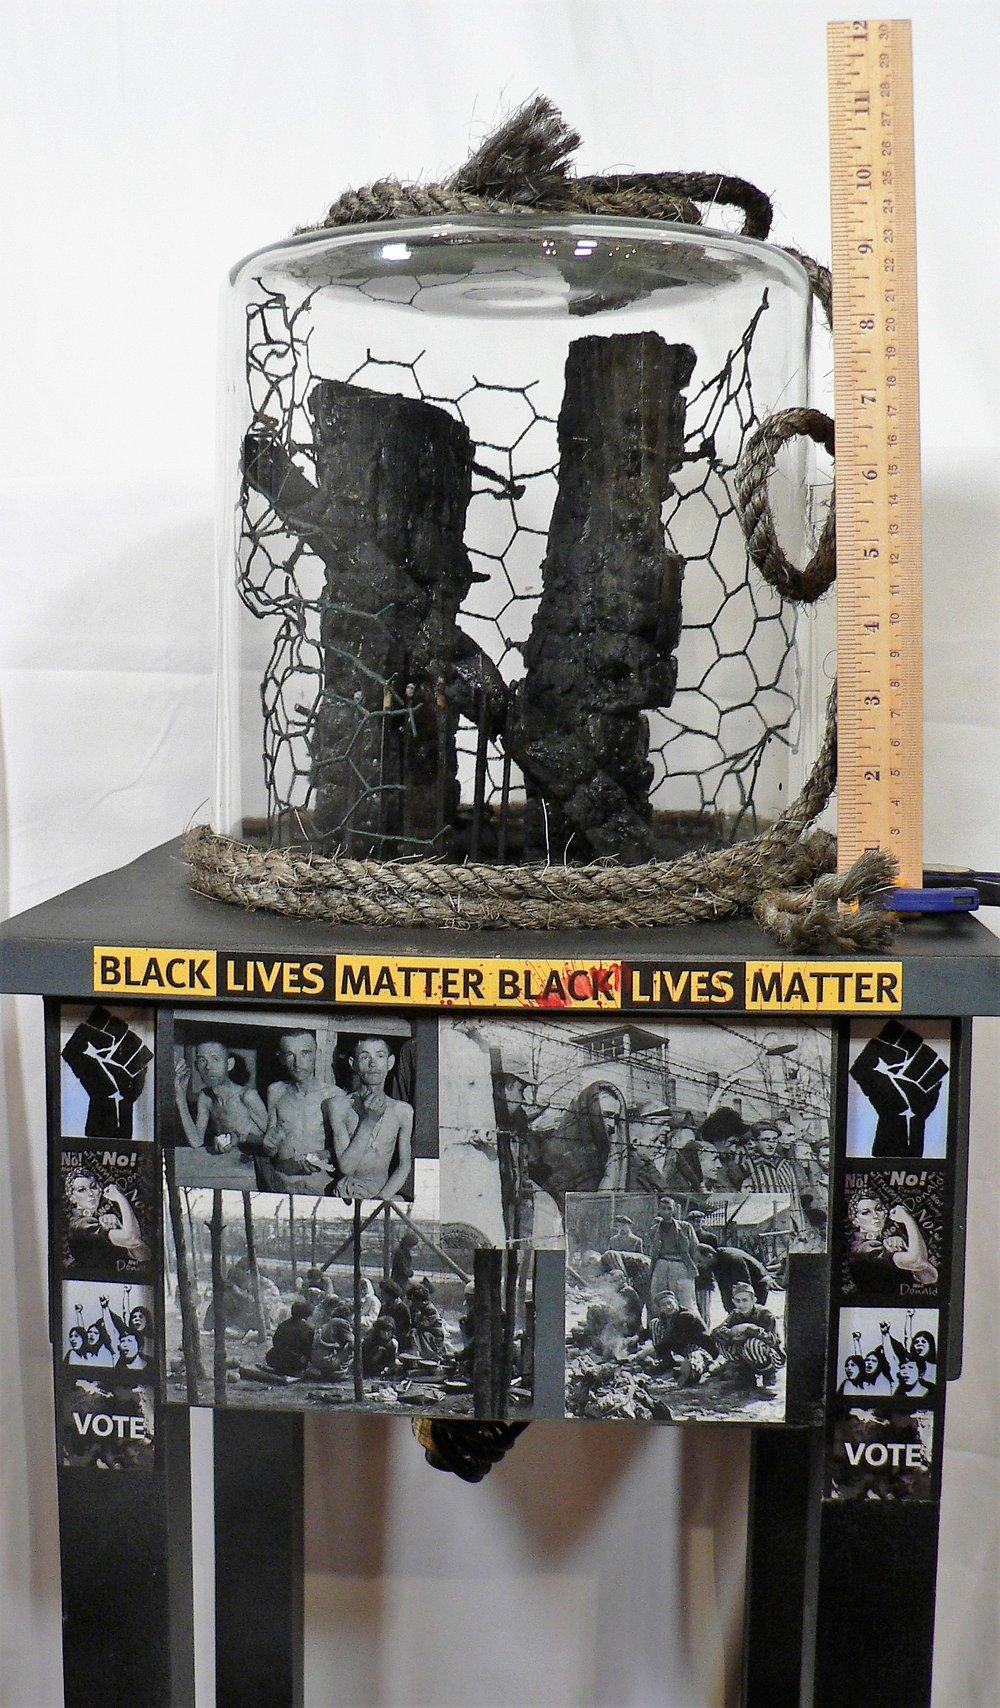 Black Lives Matter with Ruler Photo.JPG